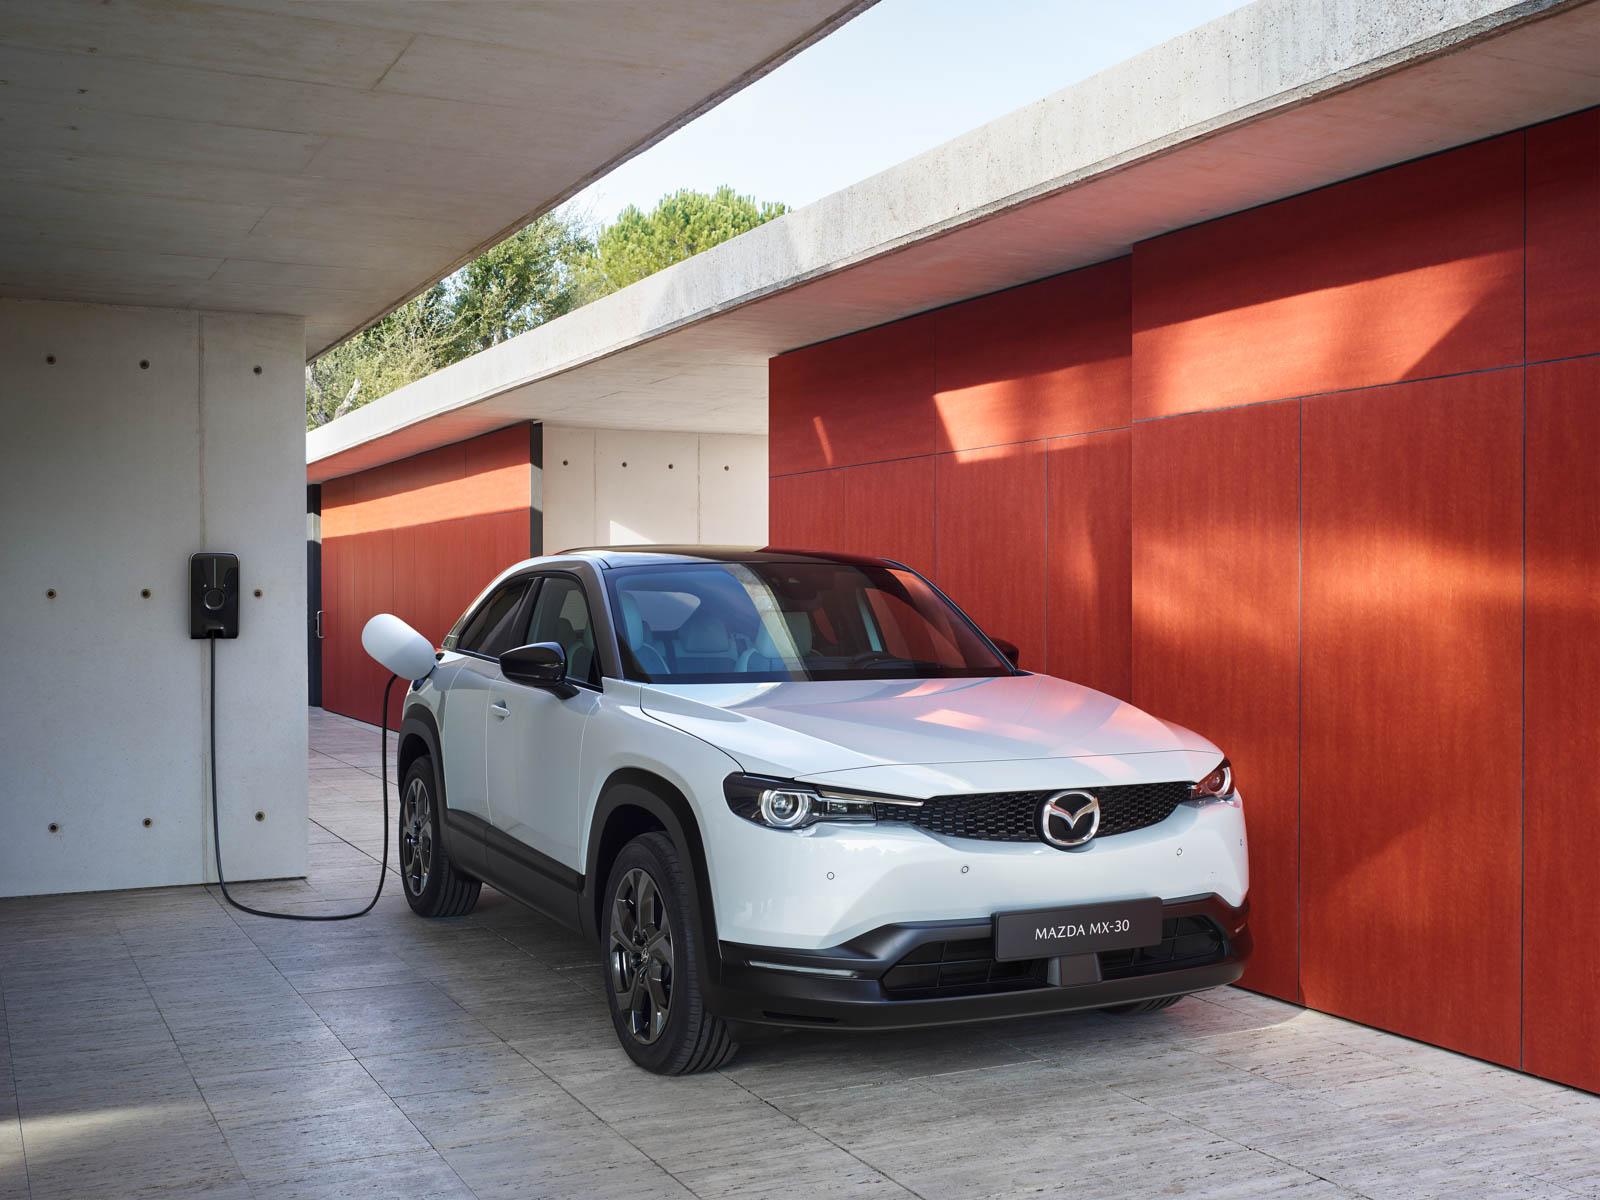 Ny elbil fra Mazda MX-30 som lades